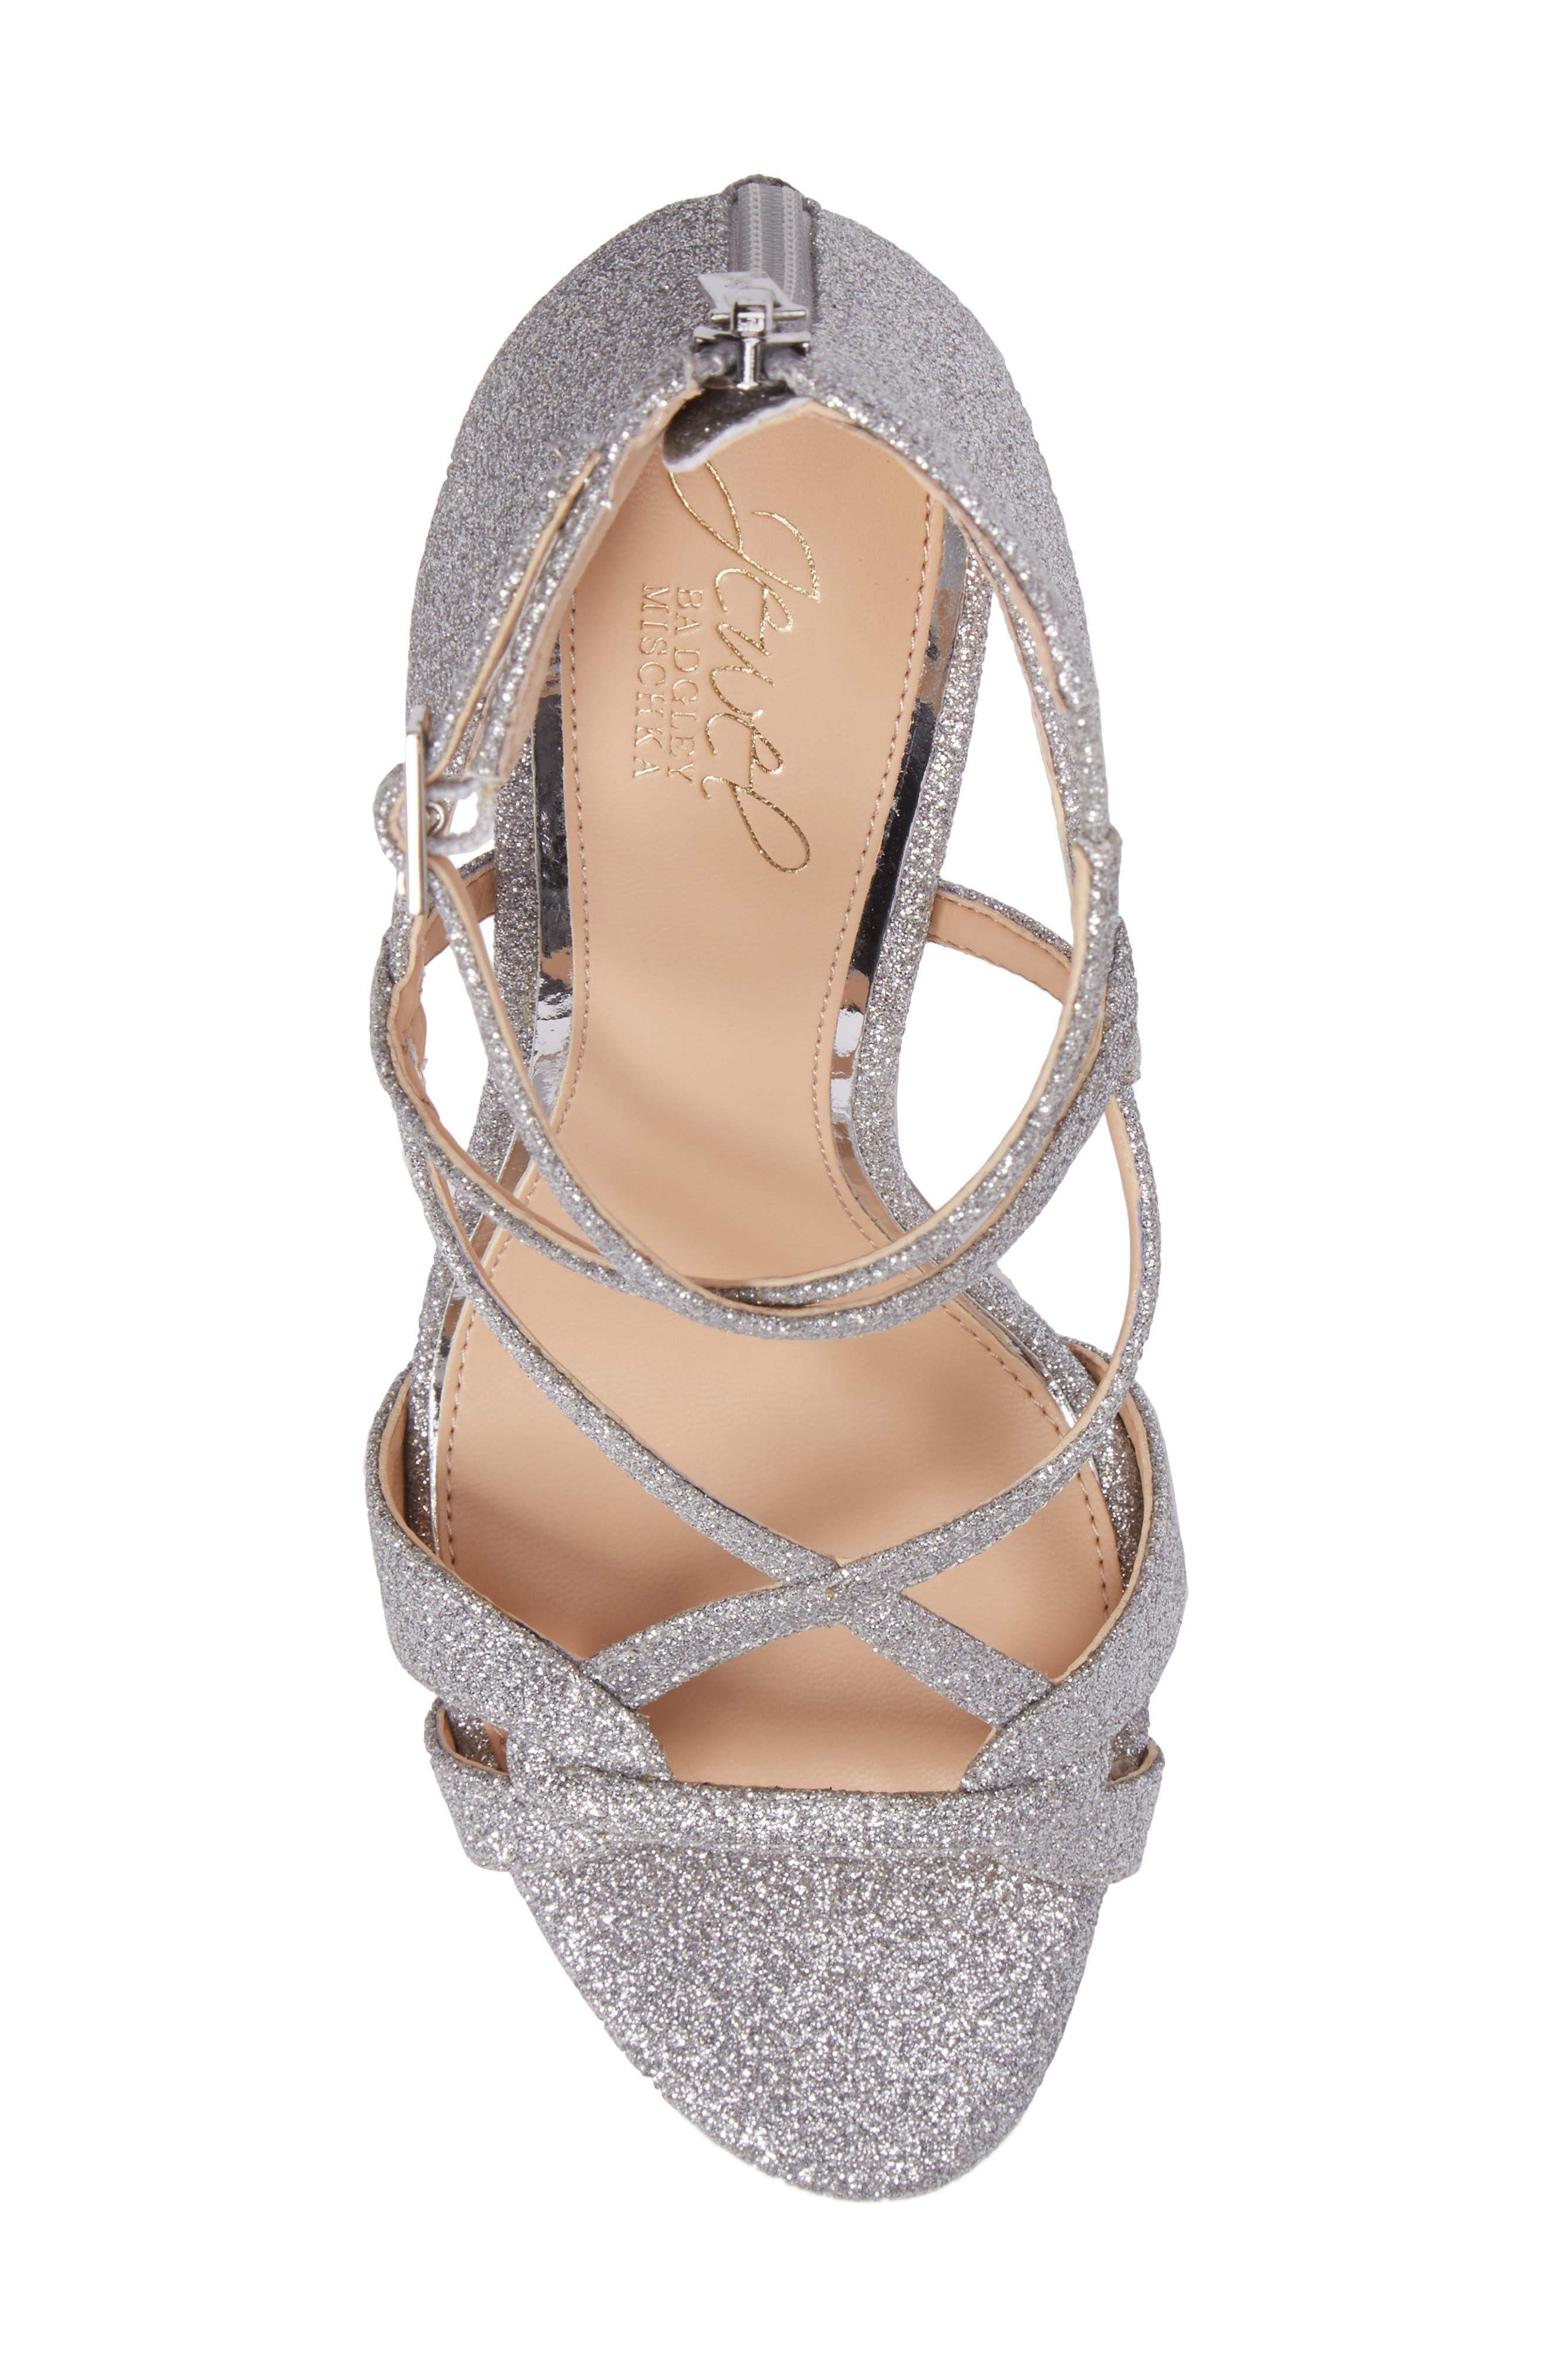 Aliza Strappy Glitter Sandal,                             Alternate thumbnail 5, color,                             043